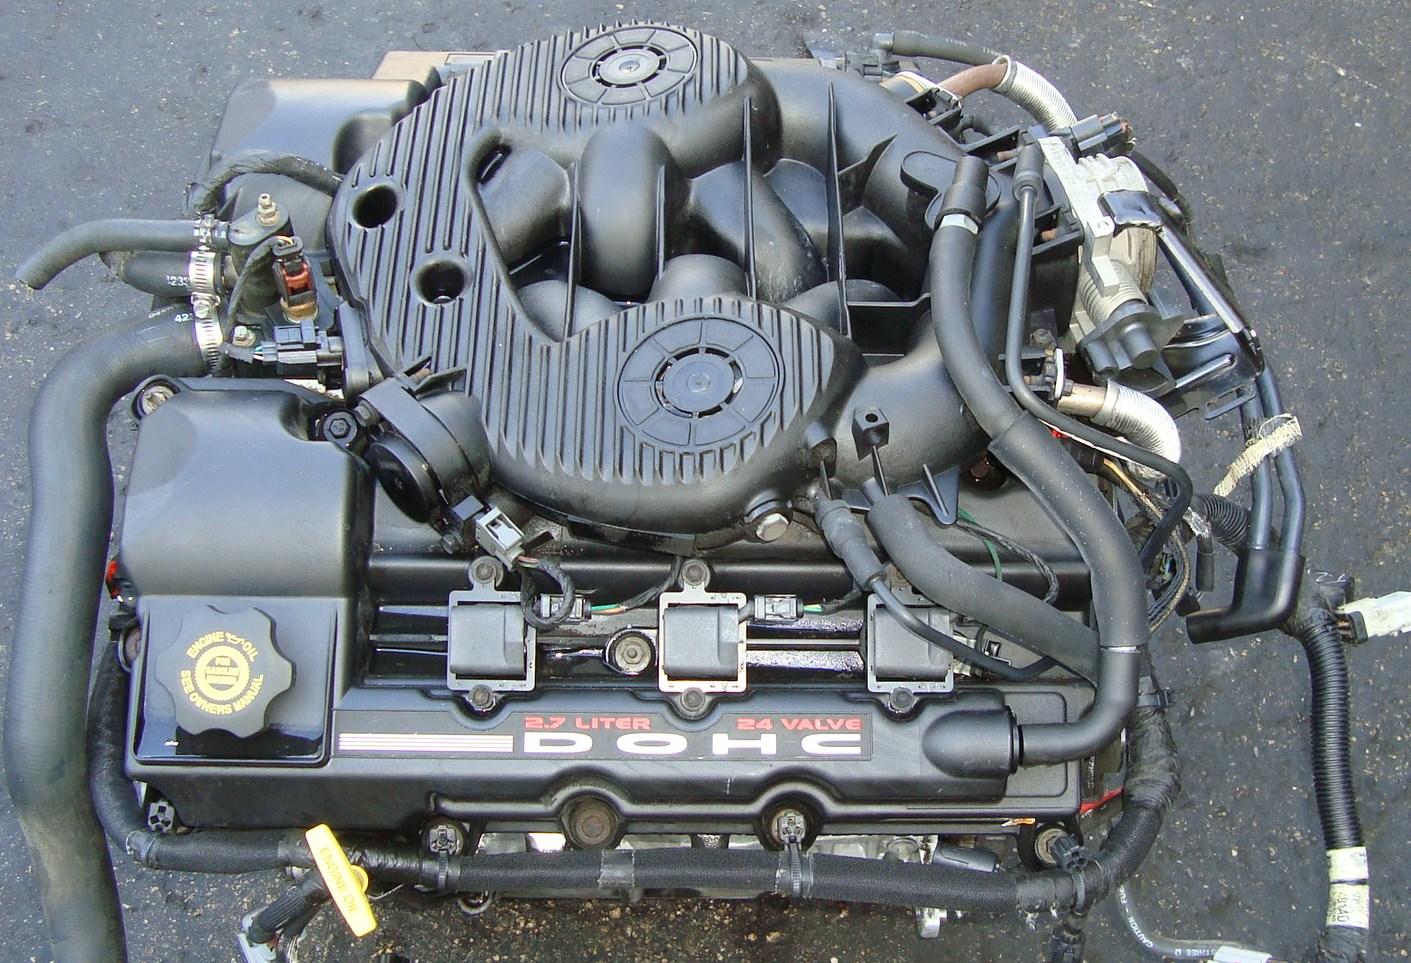 HN_8369] Chrysler 2007 2 7 Engine Diagram Download DiagramWww Mohammedshrine Librar Wiring 101